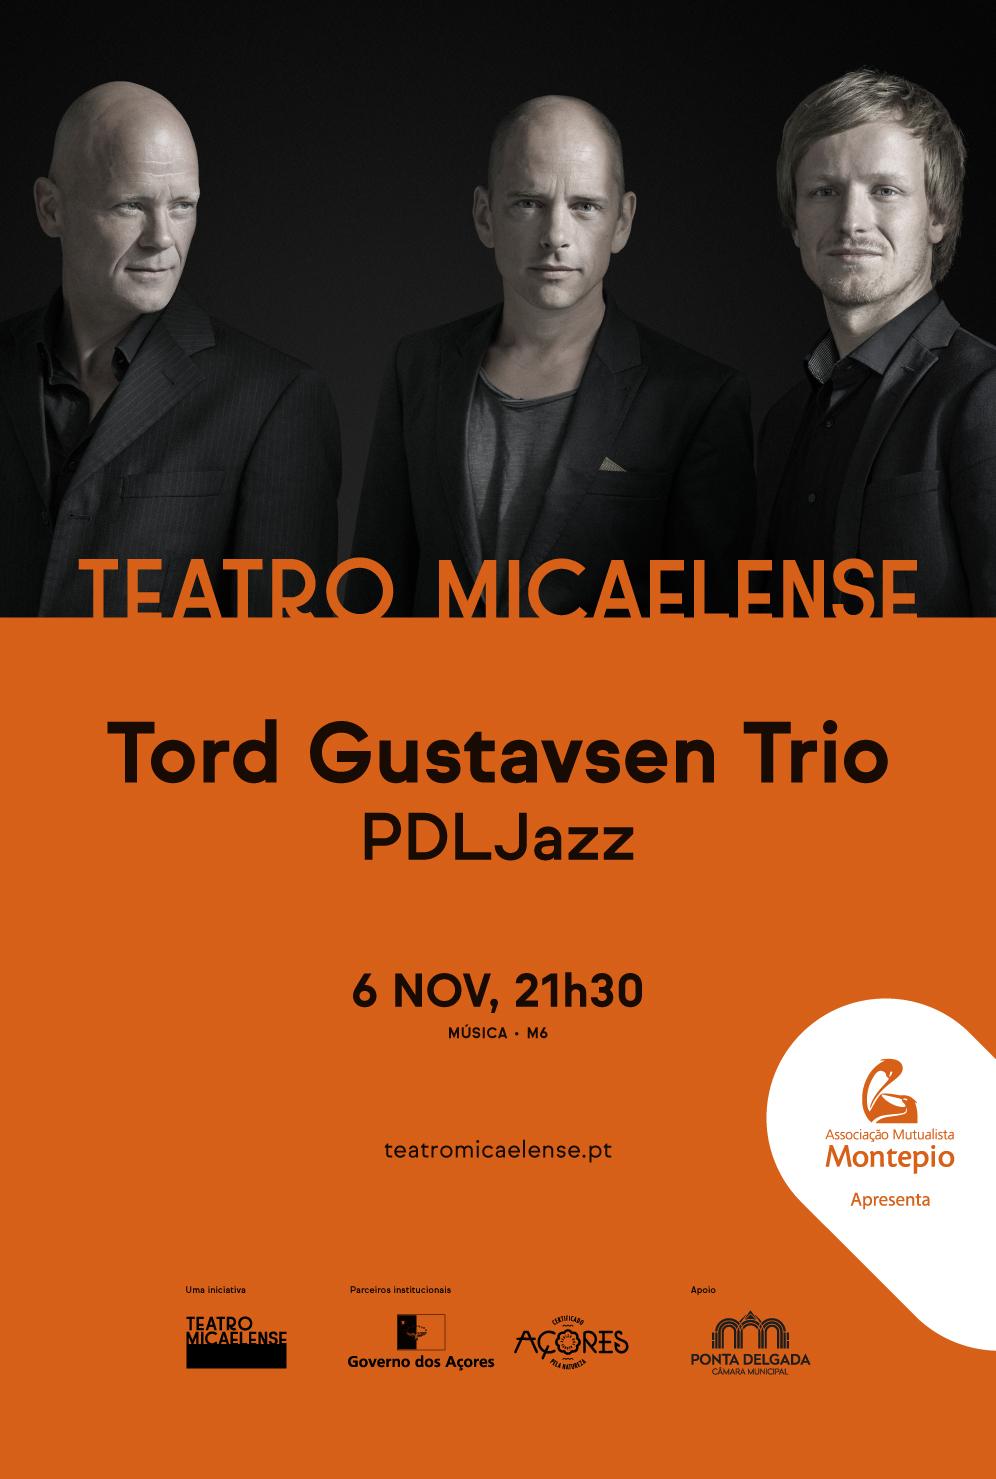 Tord Gustavsen Trio no PDL Jazz dia 6 de Novembro